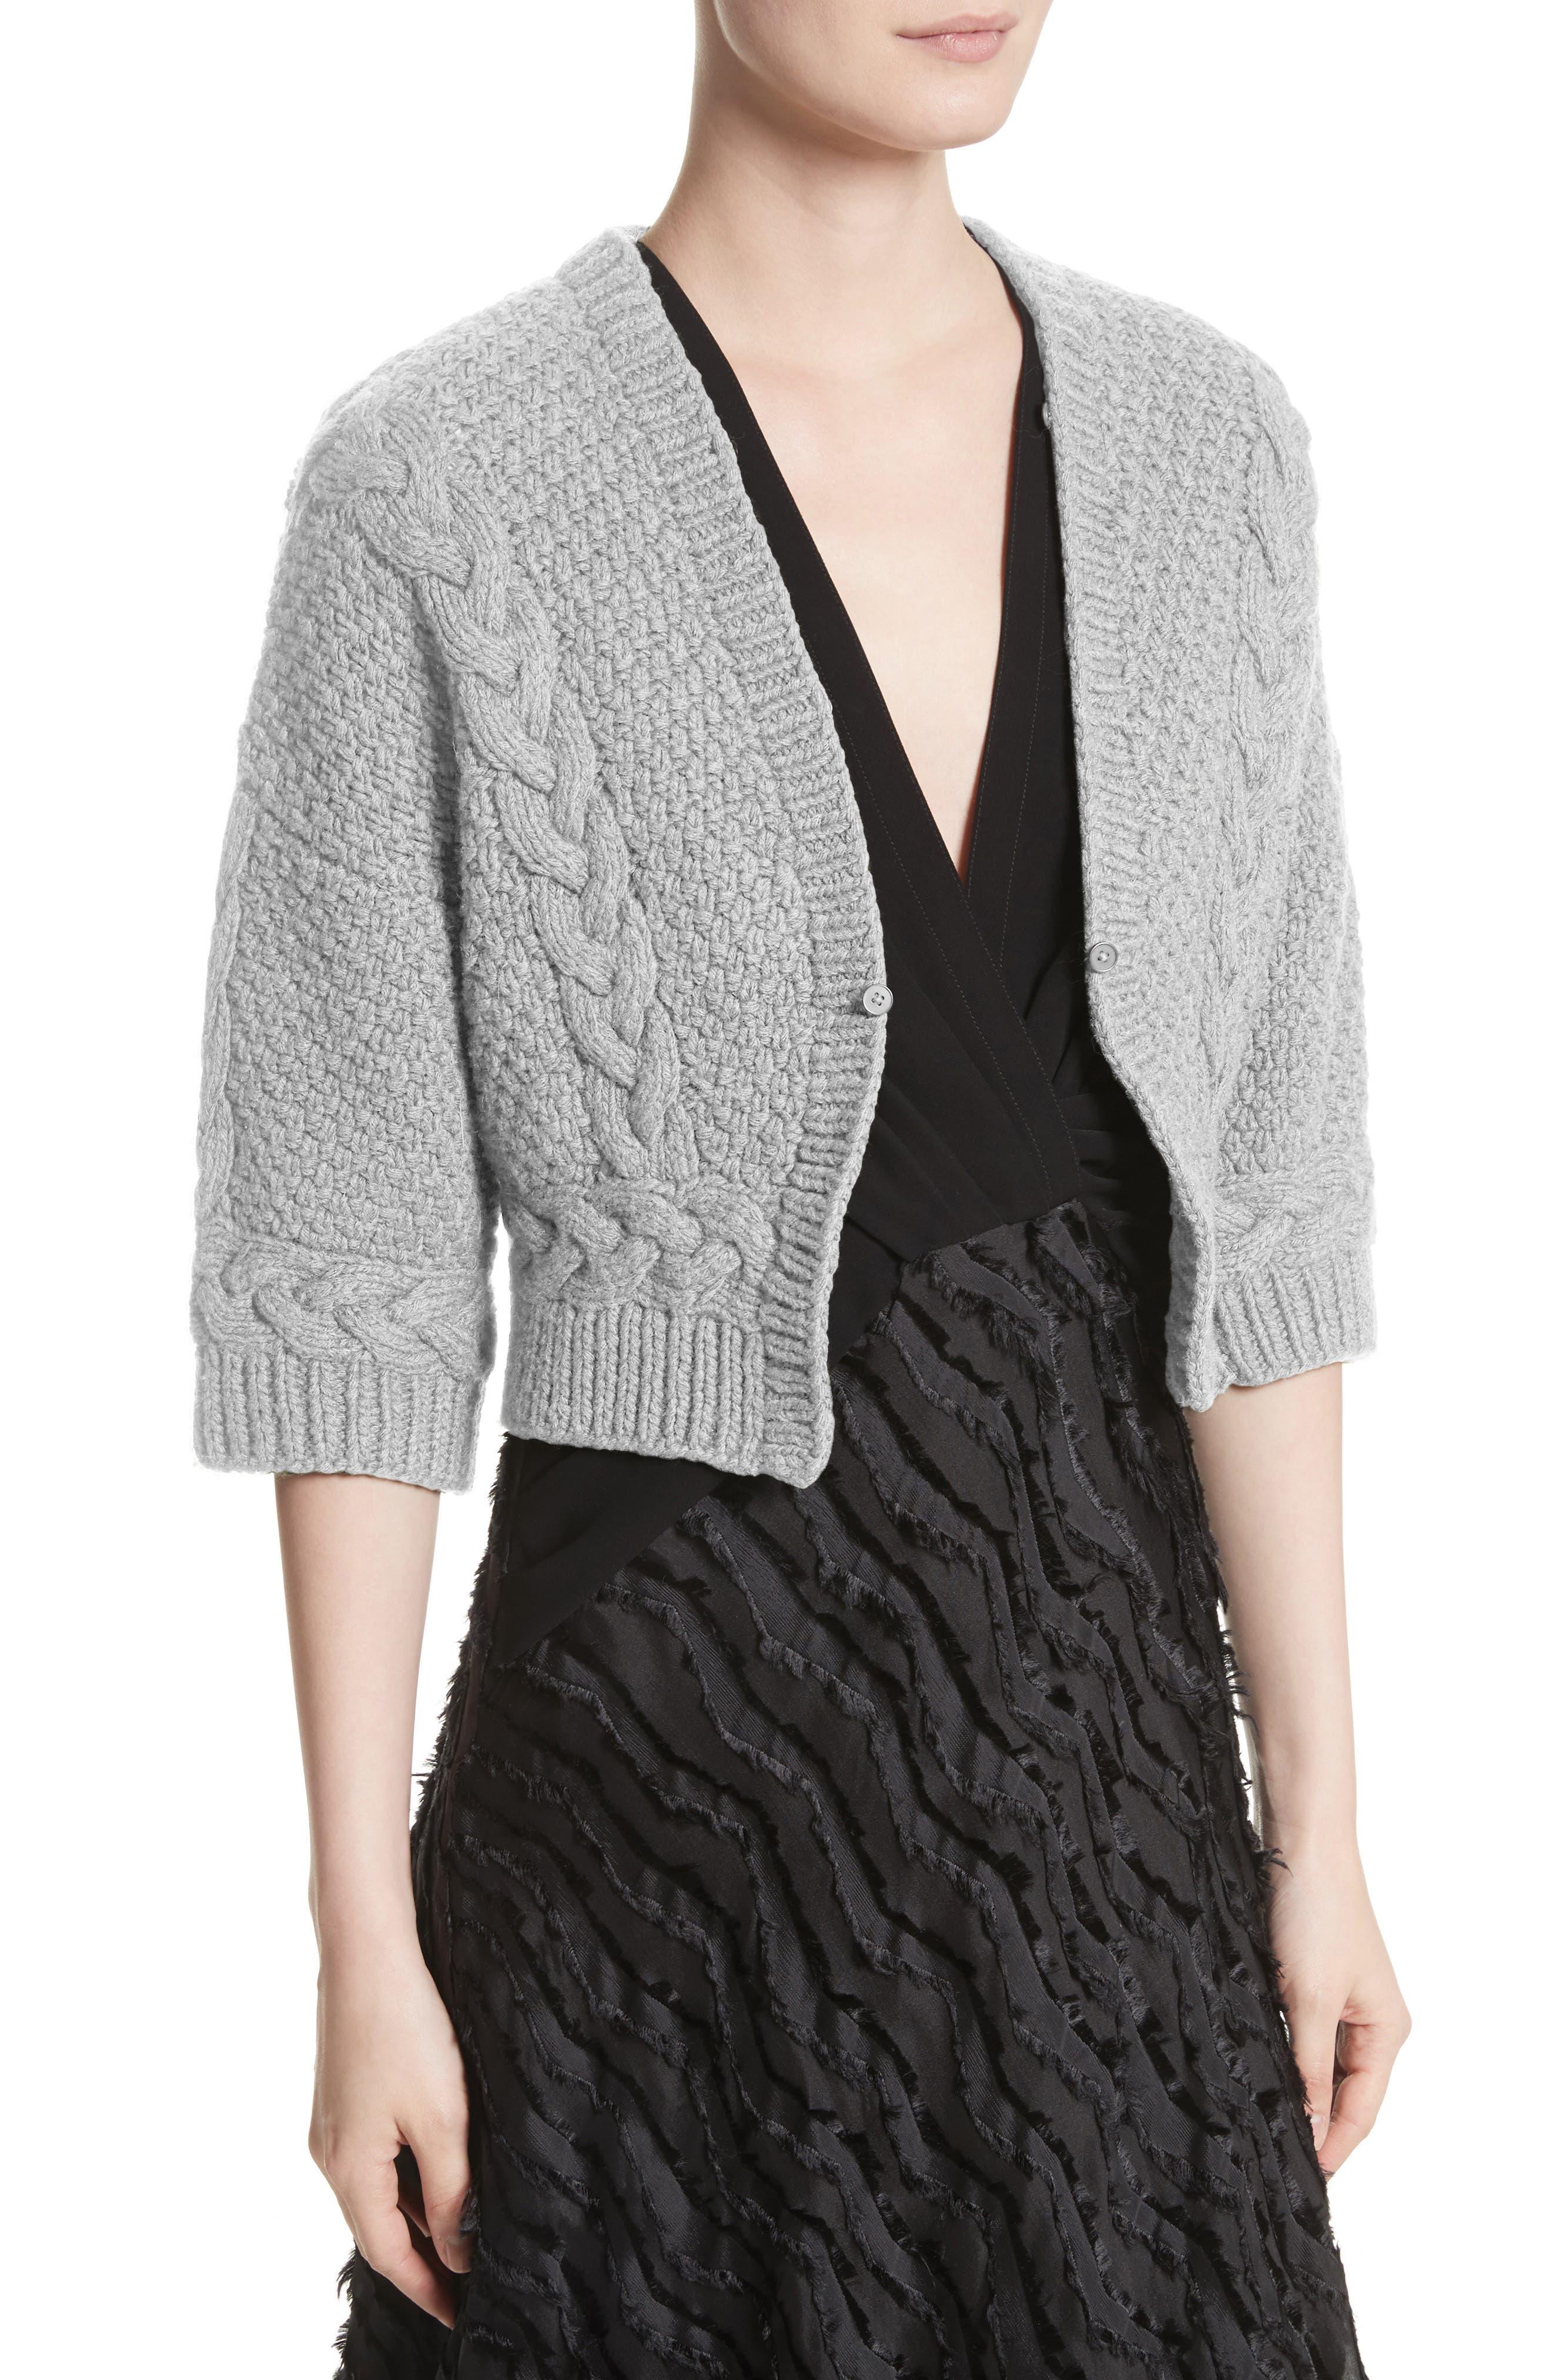 Merino Wool & Cashmere Knit Bolero with Removable Genuine Fox Fur Collar,                             Alternate thumbnail 2, color,                             087